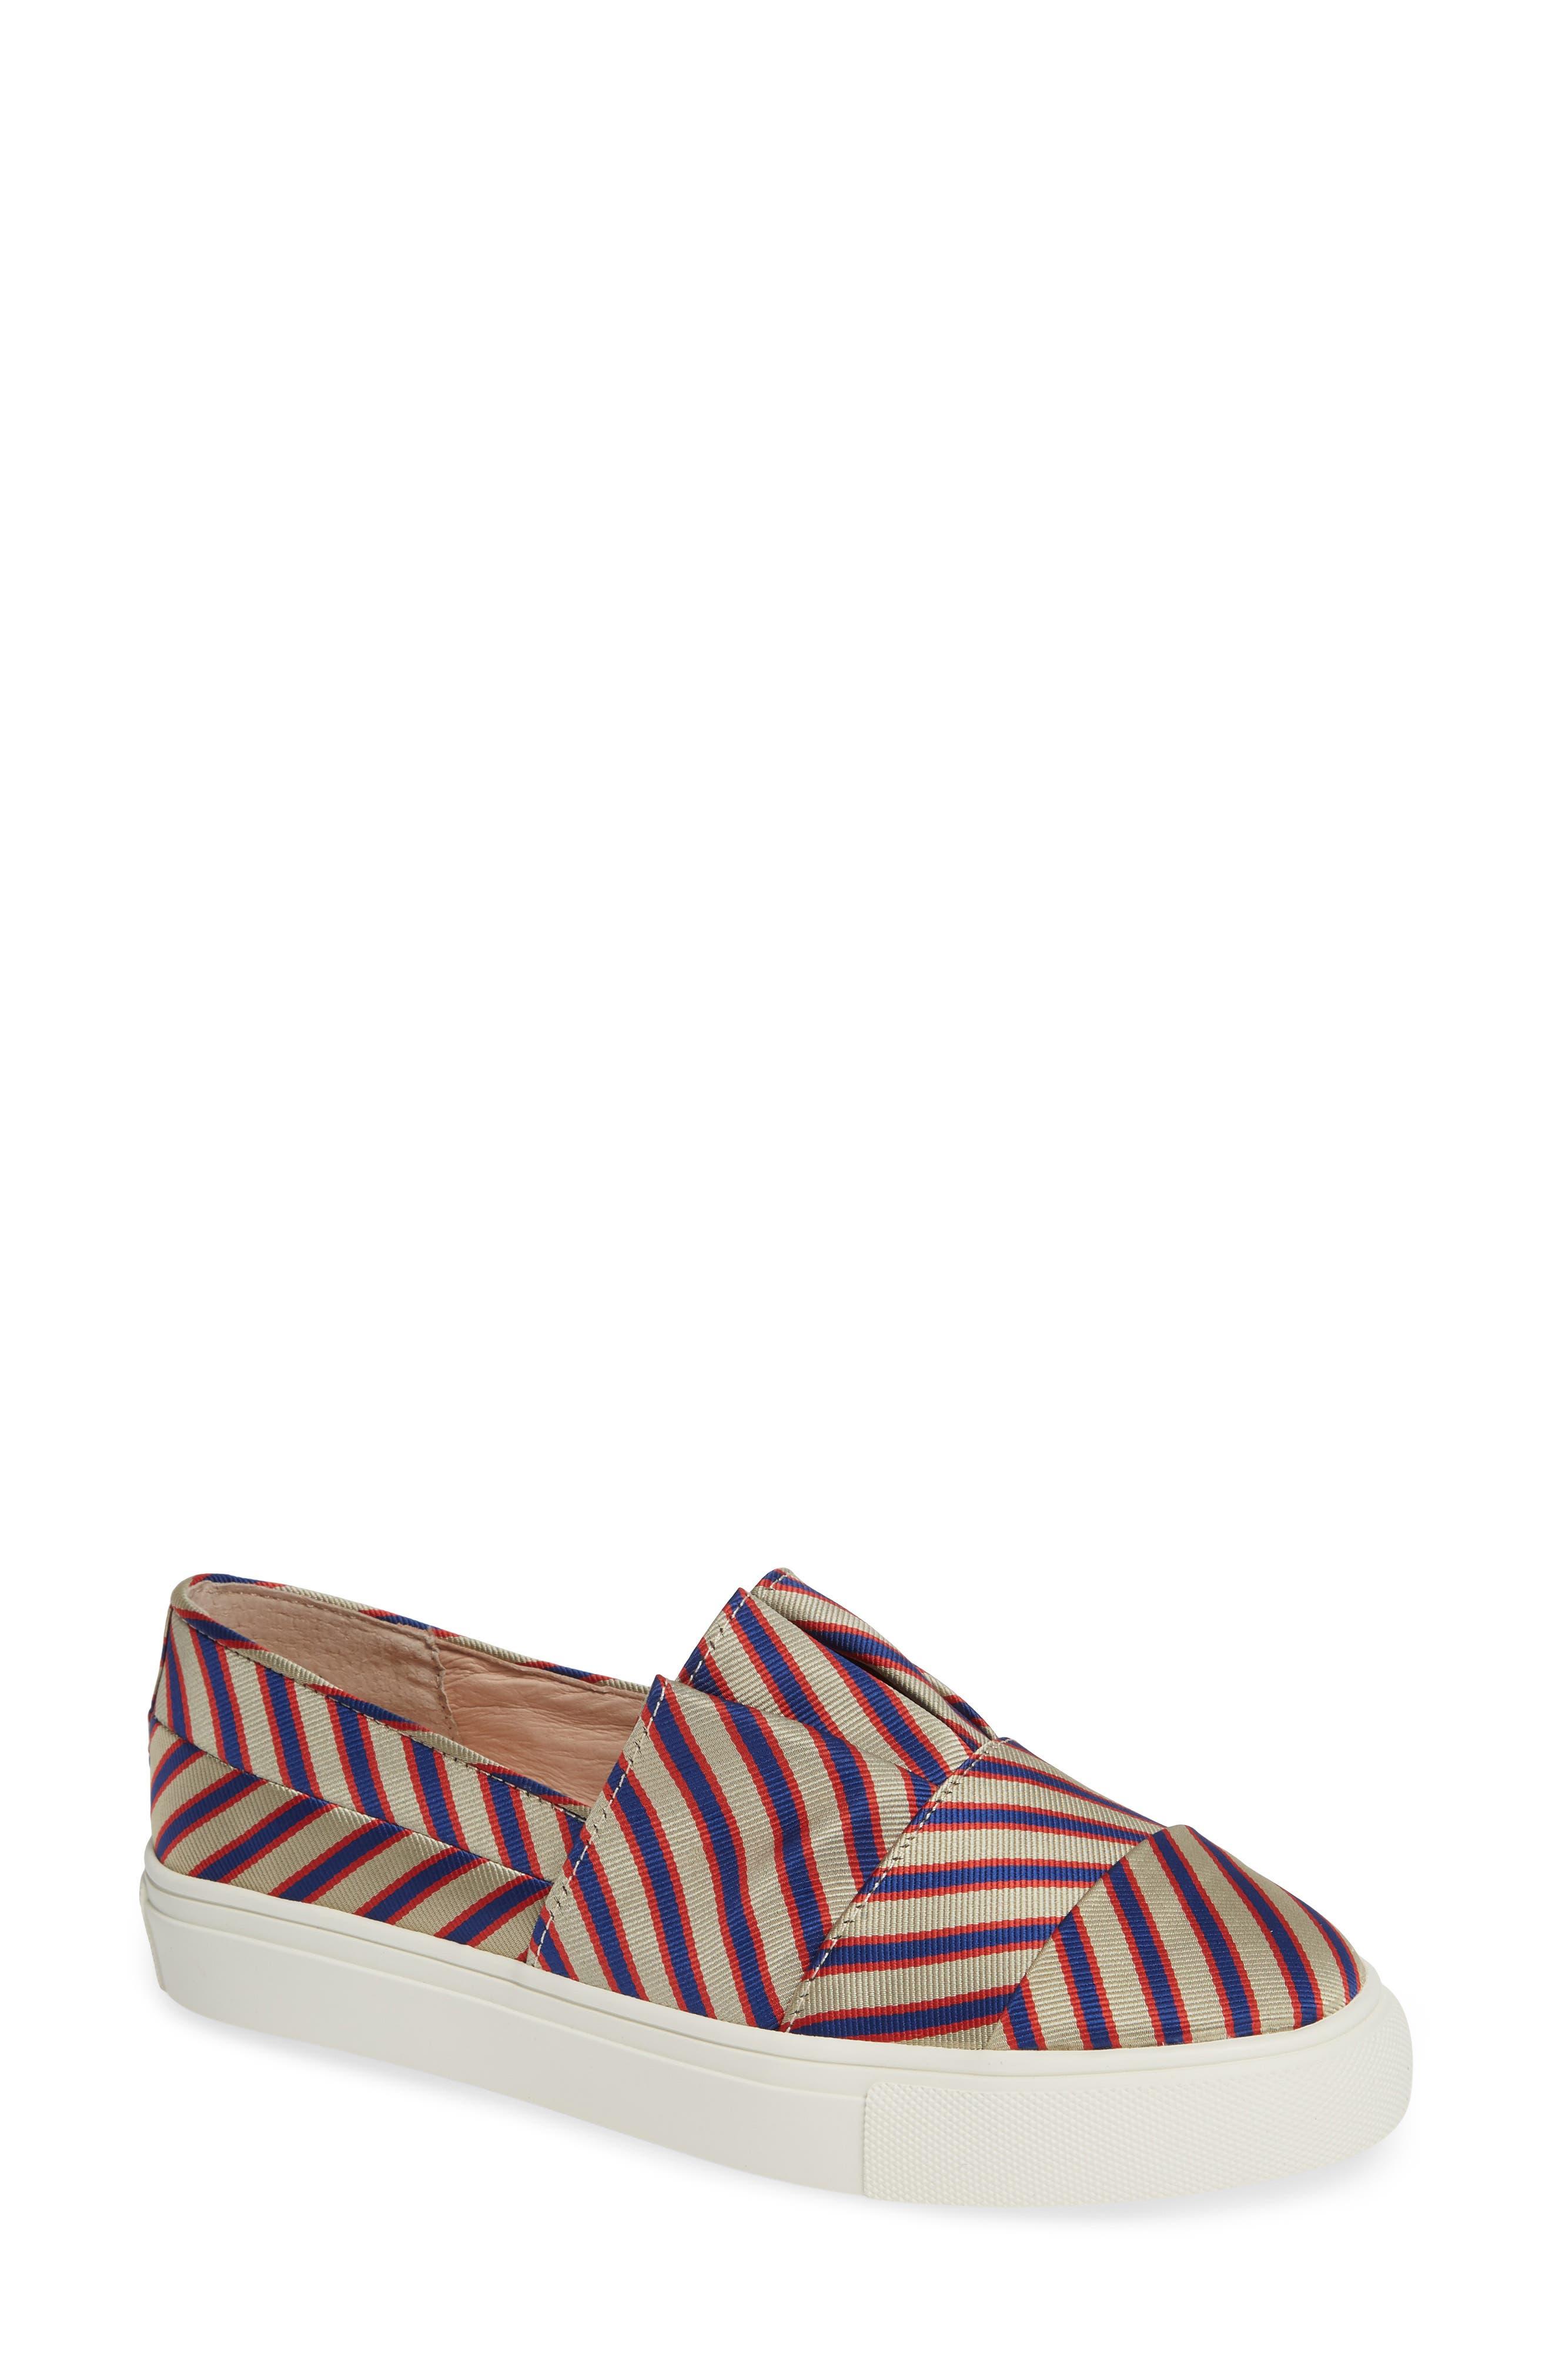 Rooney Slip-On Sneaker,                             Main thumbnail 1, color,                             RED/ WHITE/ BLUE FABRIC